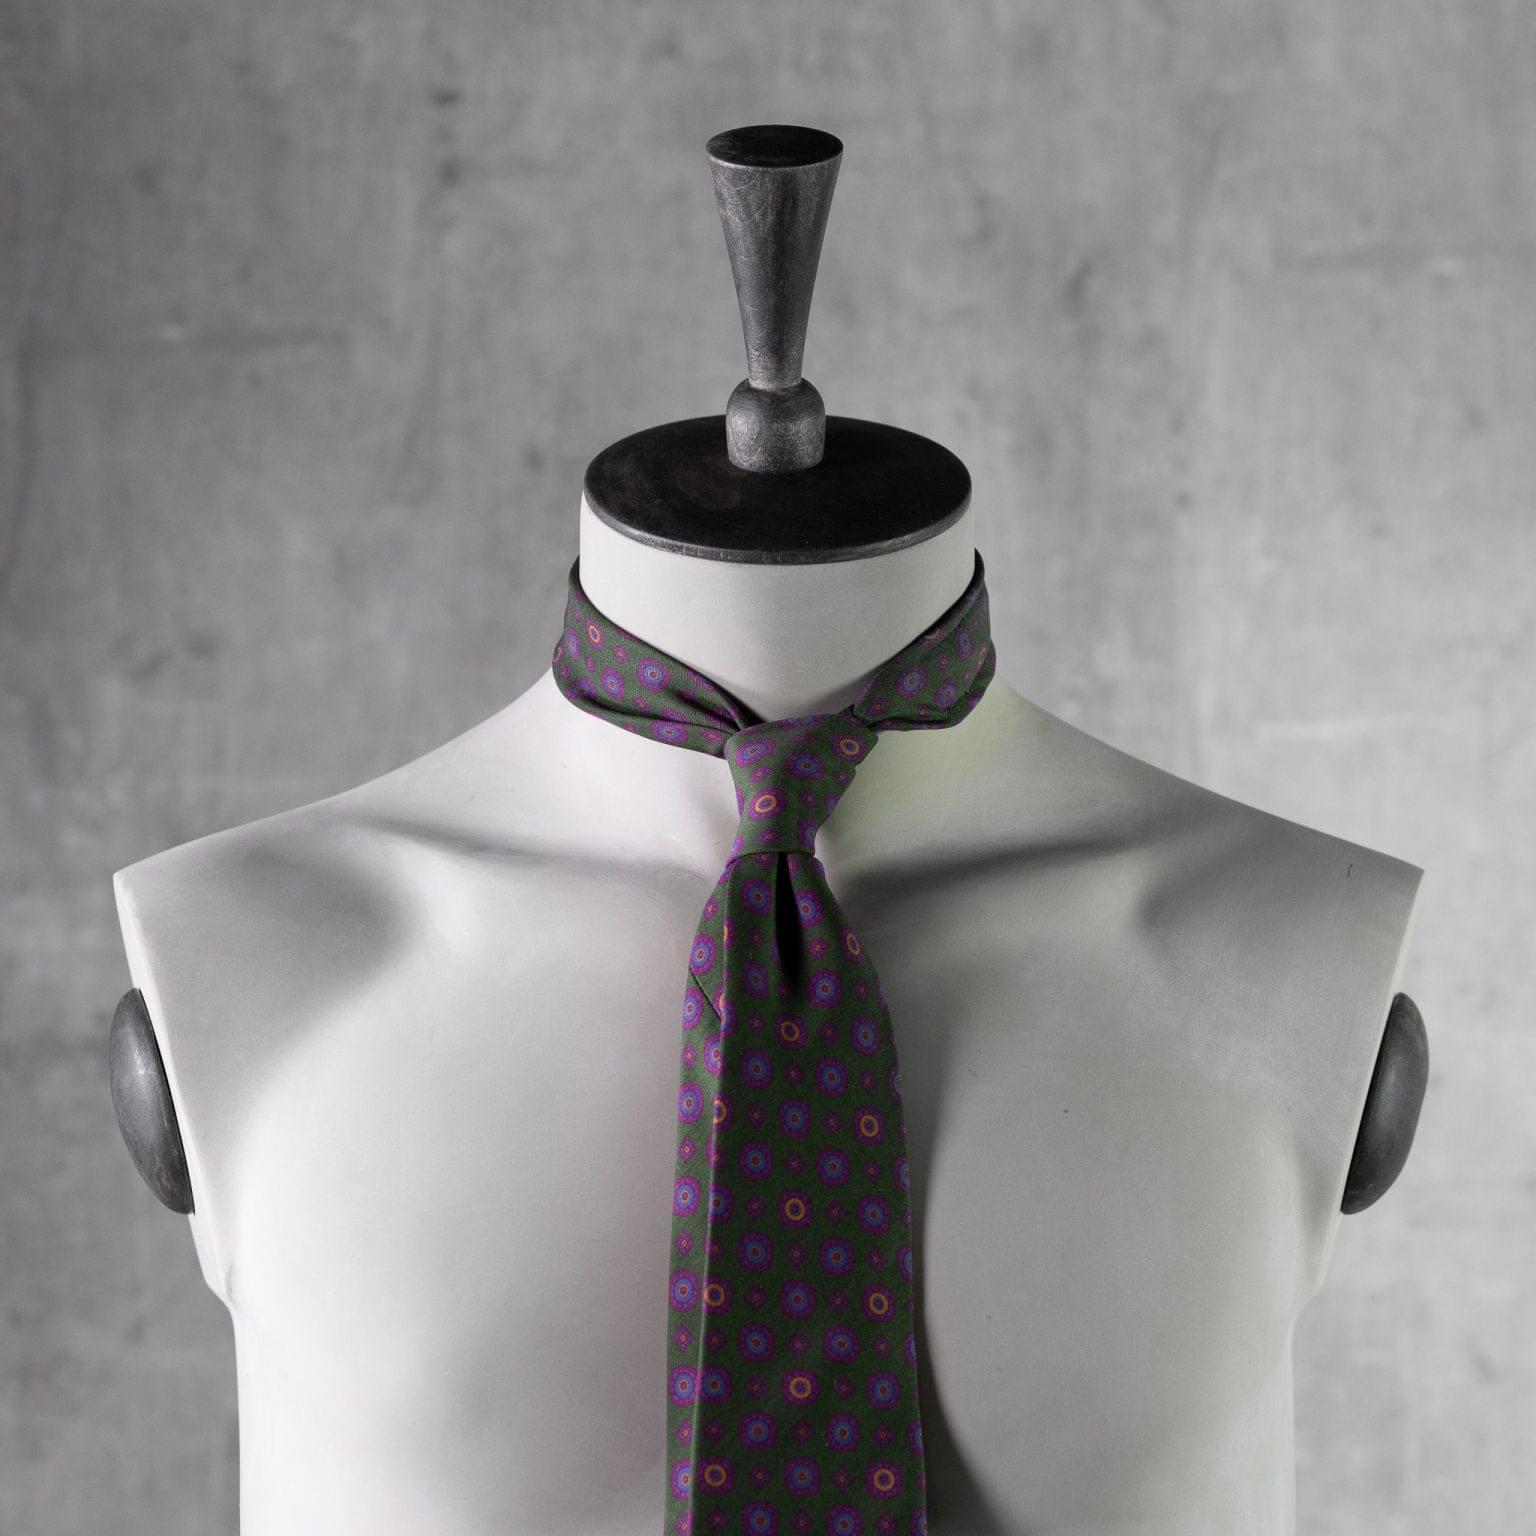 PRINTED-SILK-SEDA-ESTAMPADA-0433-Tie-Initials-Corbata-Iniciales-The-Seelk-3